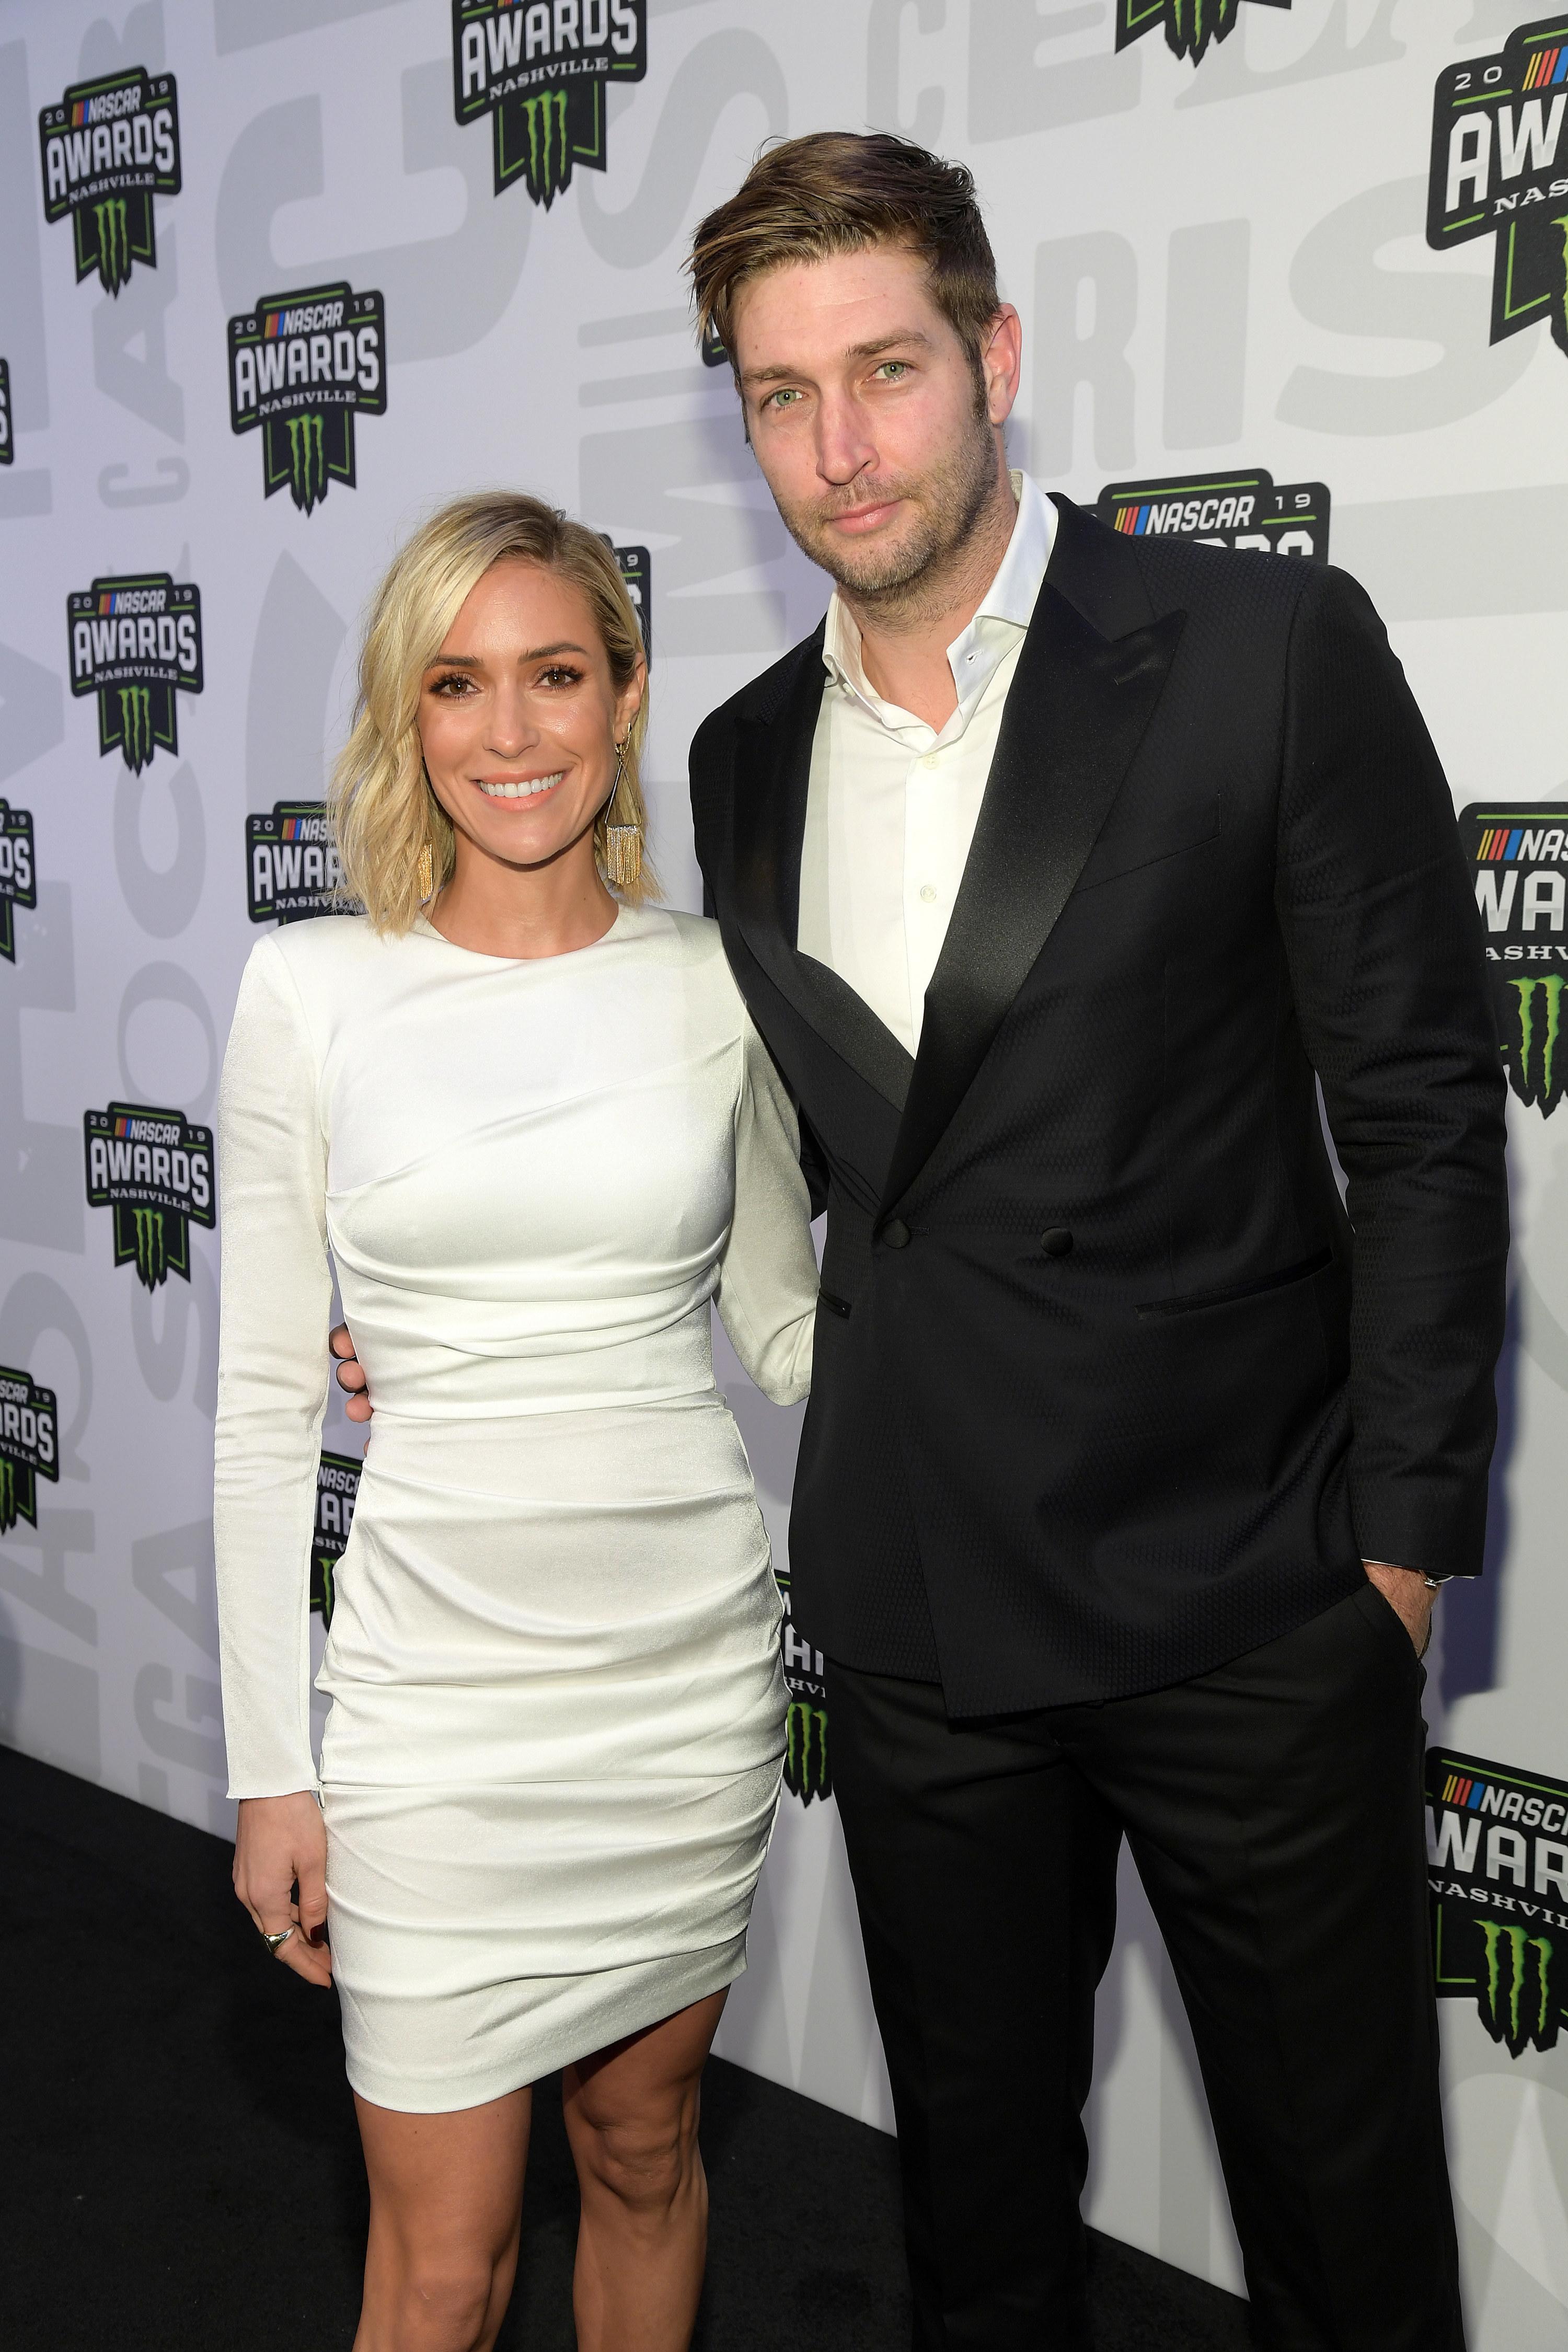 Kristin Cavallari posing  with ex-husband Jay Cutler at the 2019 Nascar Awards